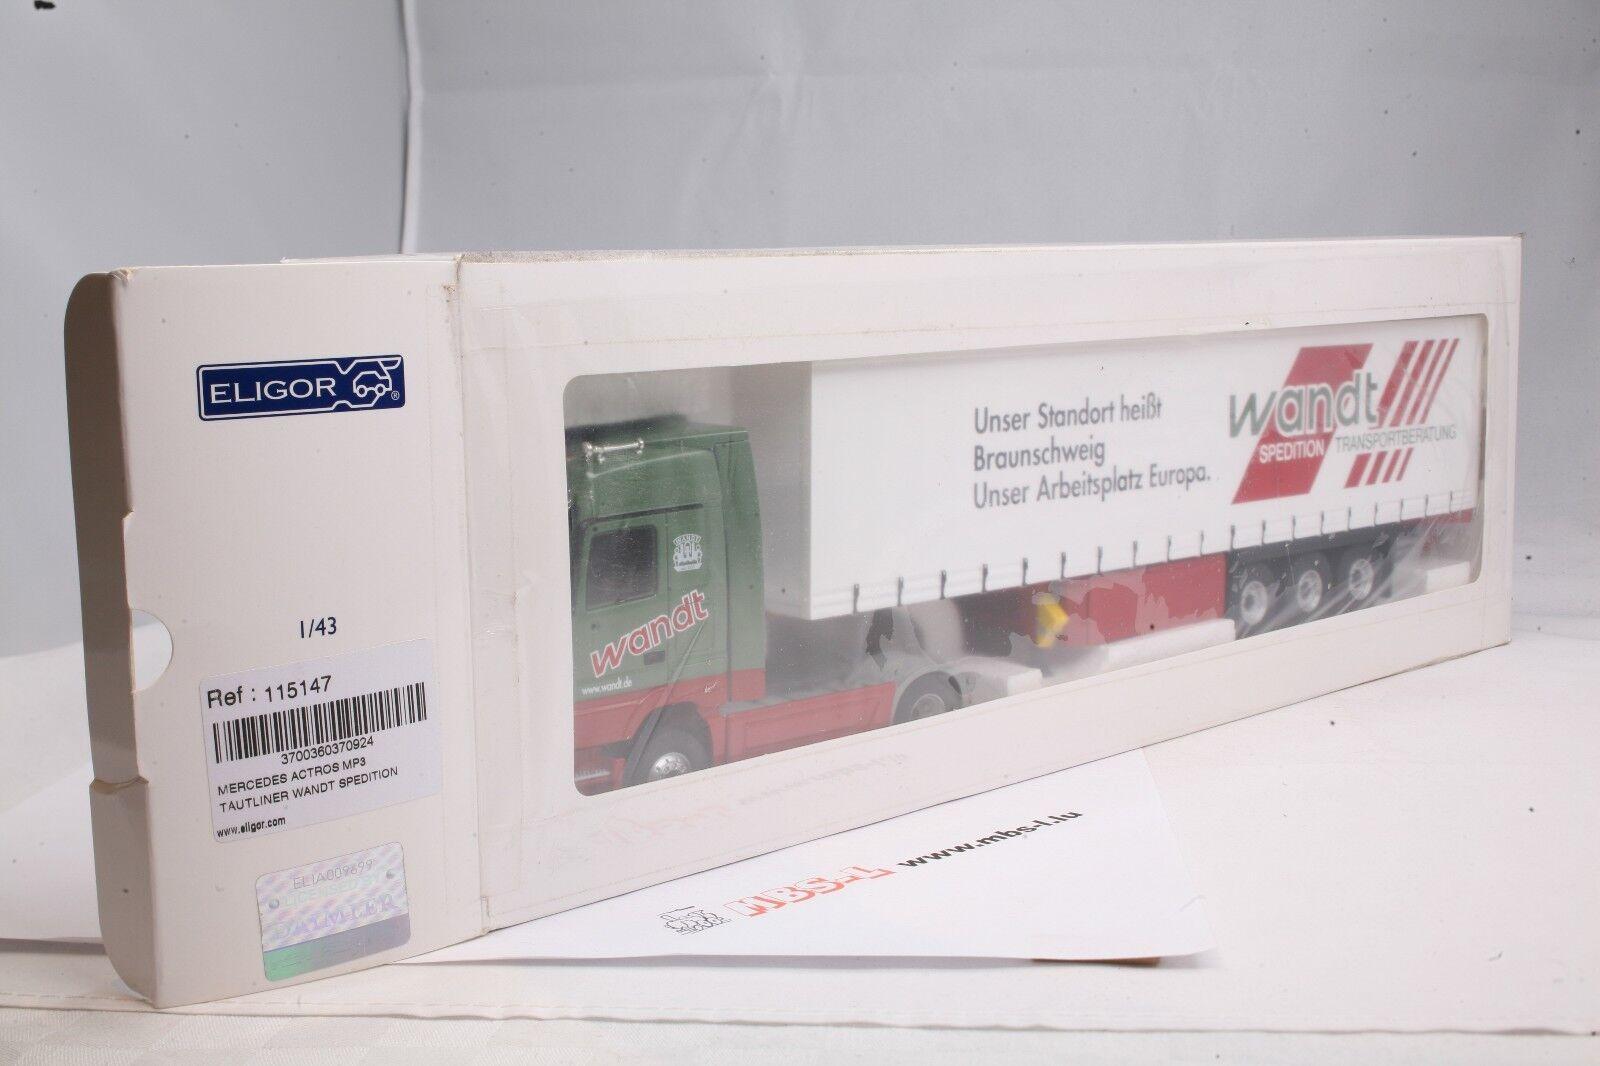 LKW Eligor 115147 Mercedes Actros MP3 MP3 MP3 Tautliner  Wandt Spedition  1 43  | Düsseldorf Online Shop  9b8bf0